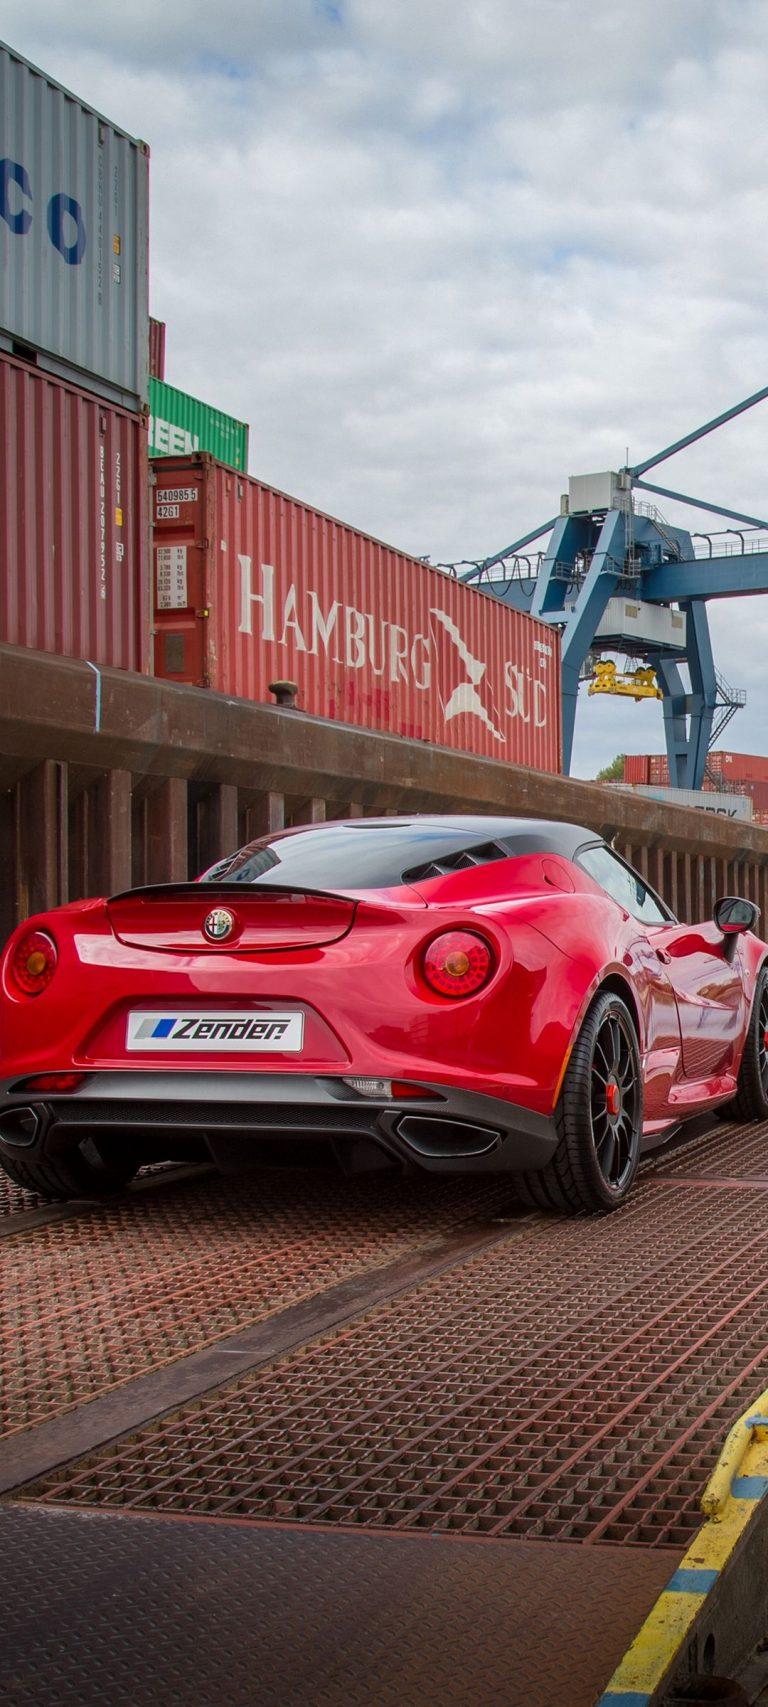 Alfa Romeo 4c Zender Red Rear View 1080x2400 768x1707